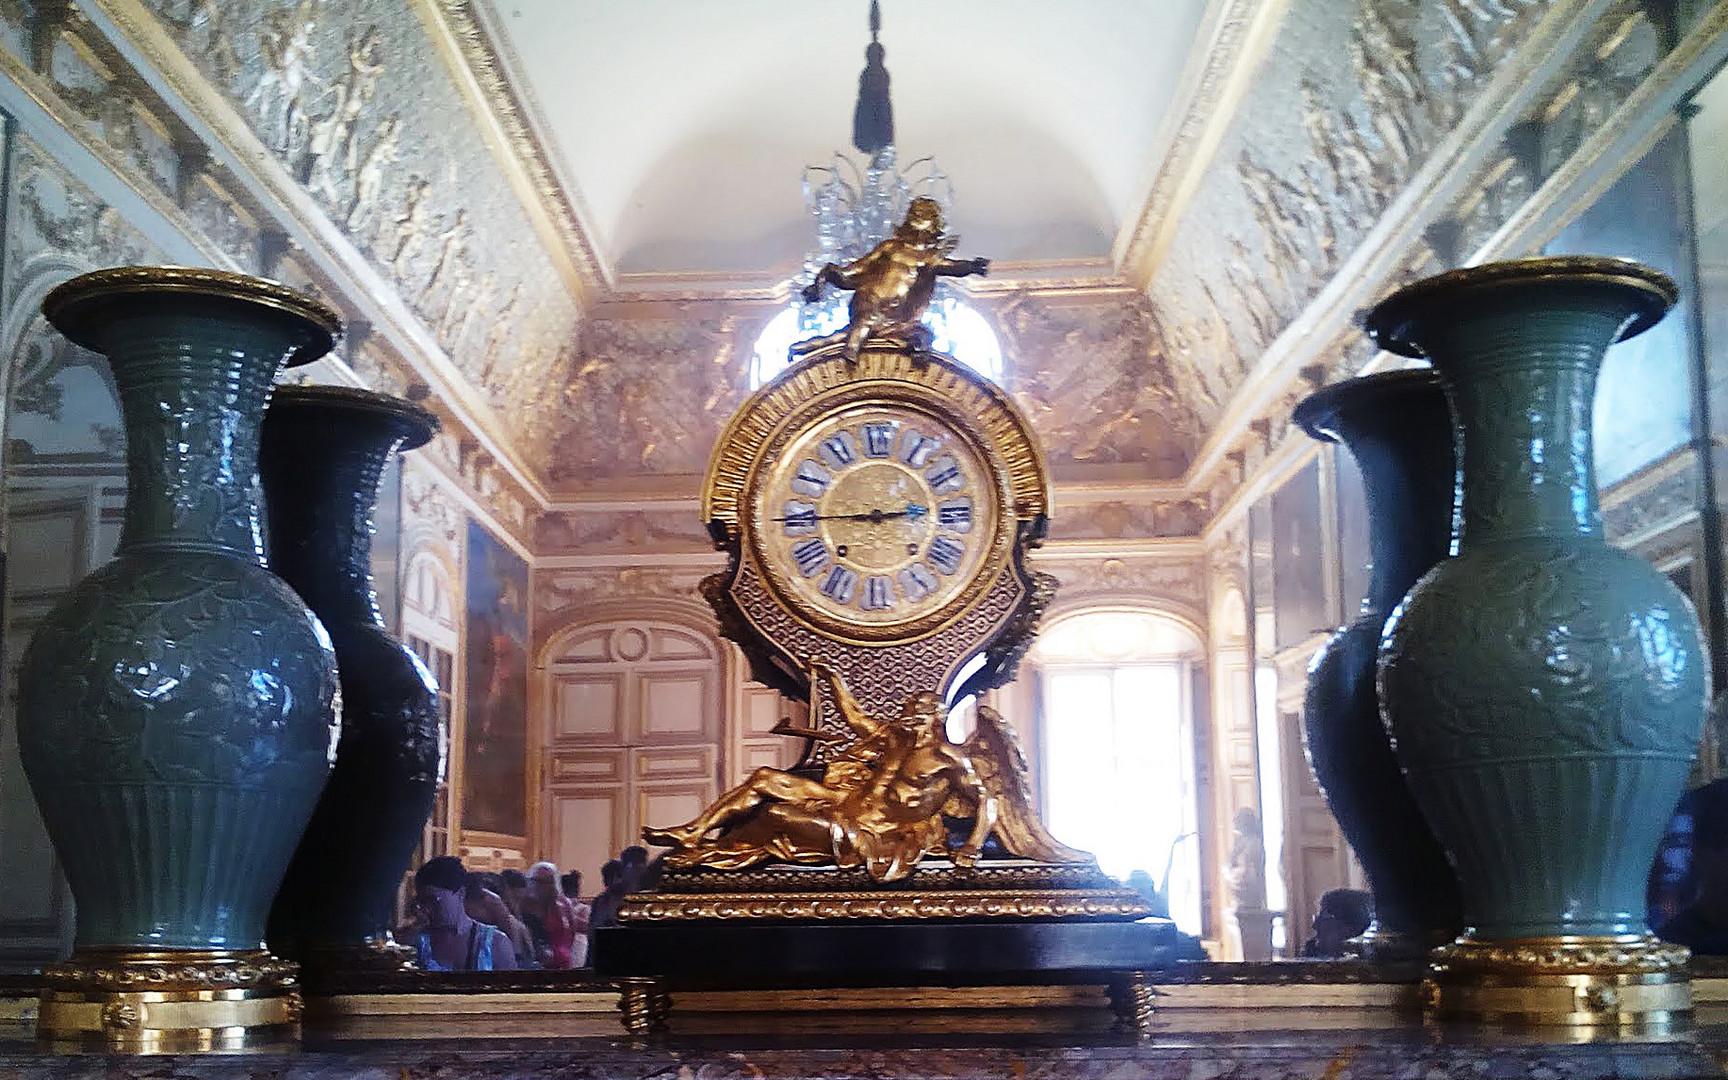 Time Stops at Versailles